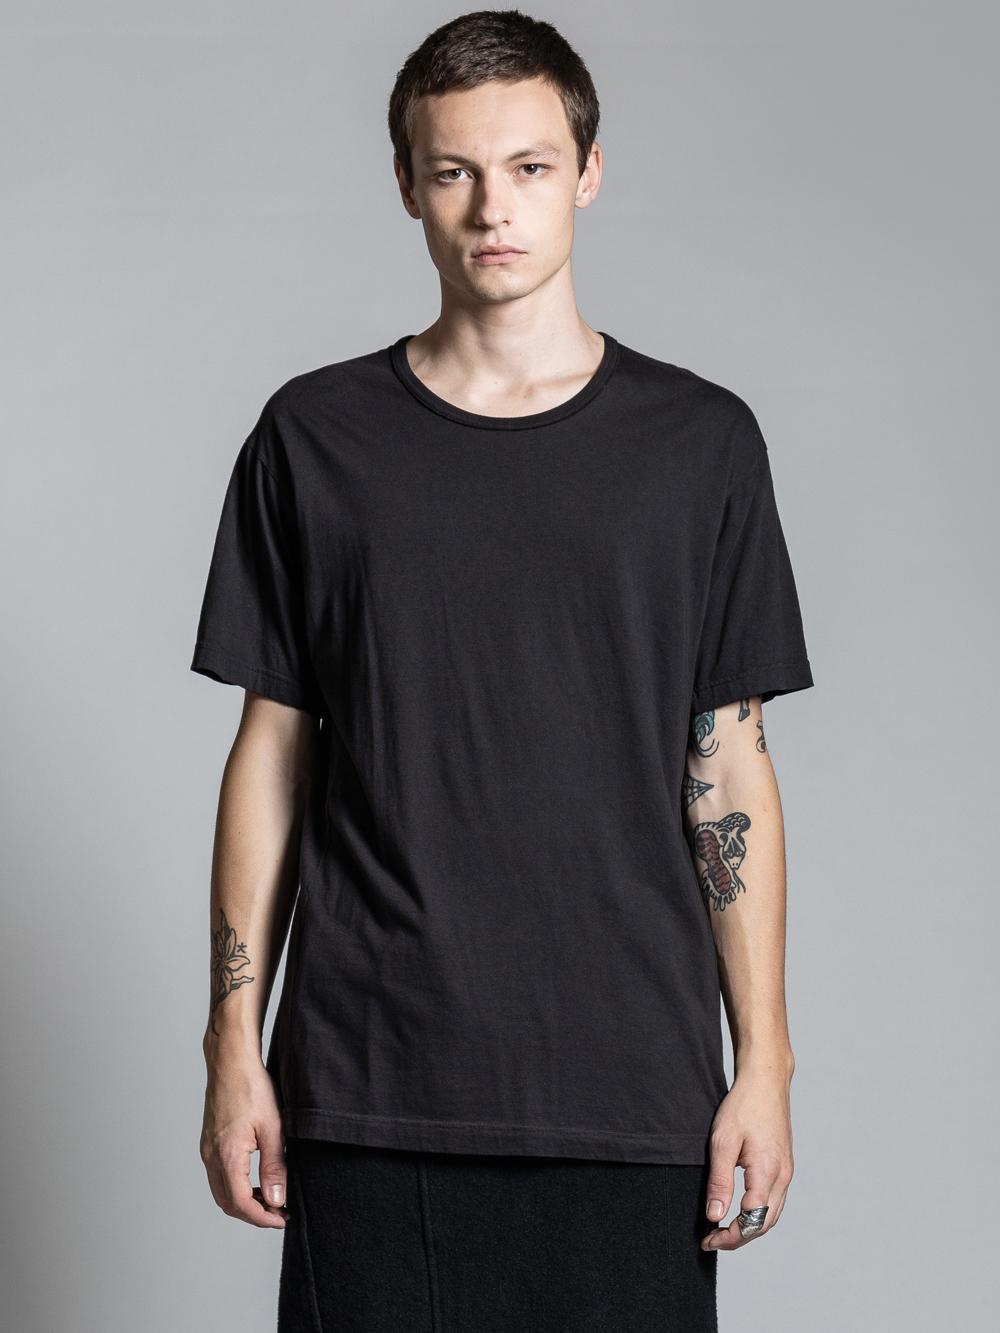 VI-2980-01 / レッドステッチ 半袖Tシャツ